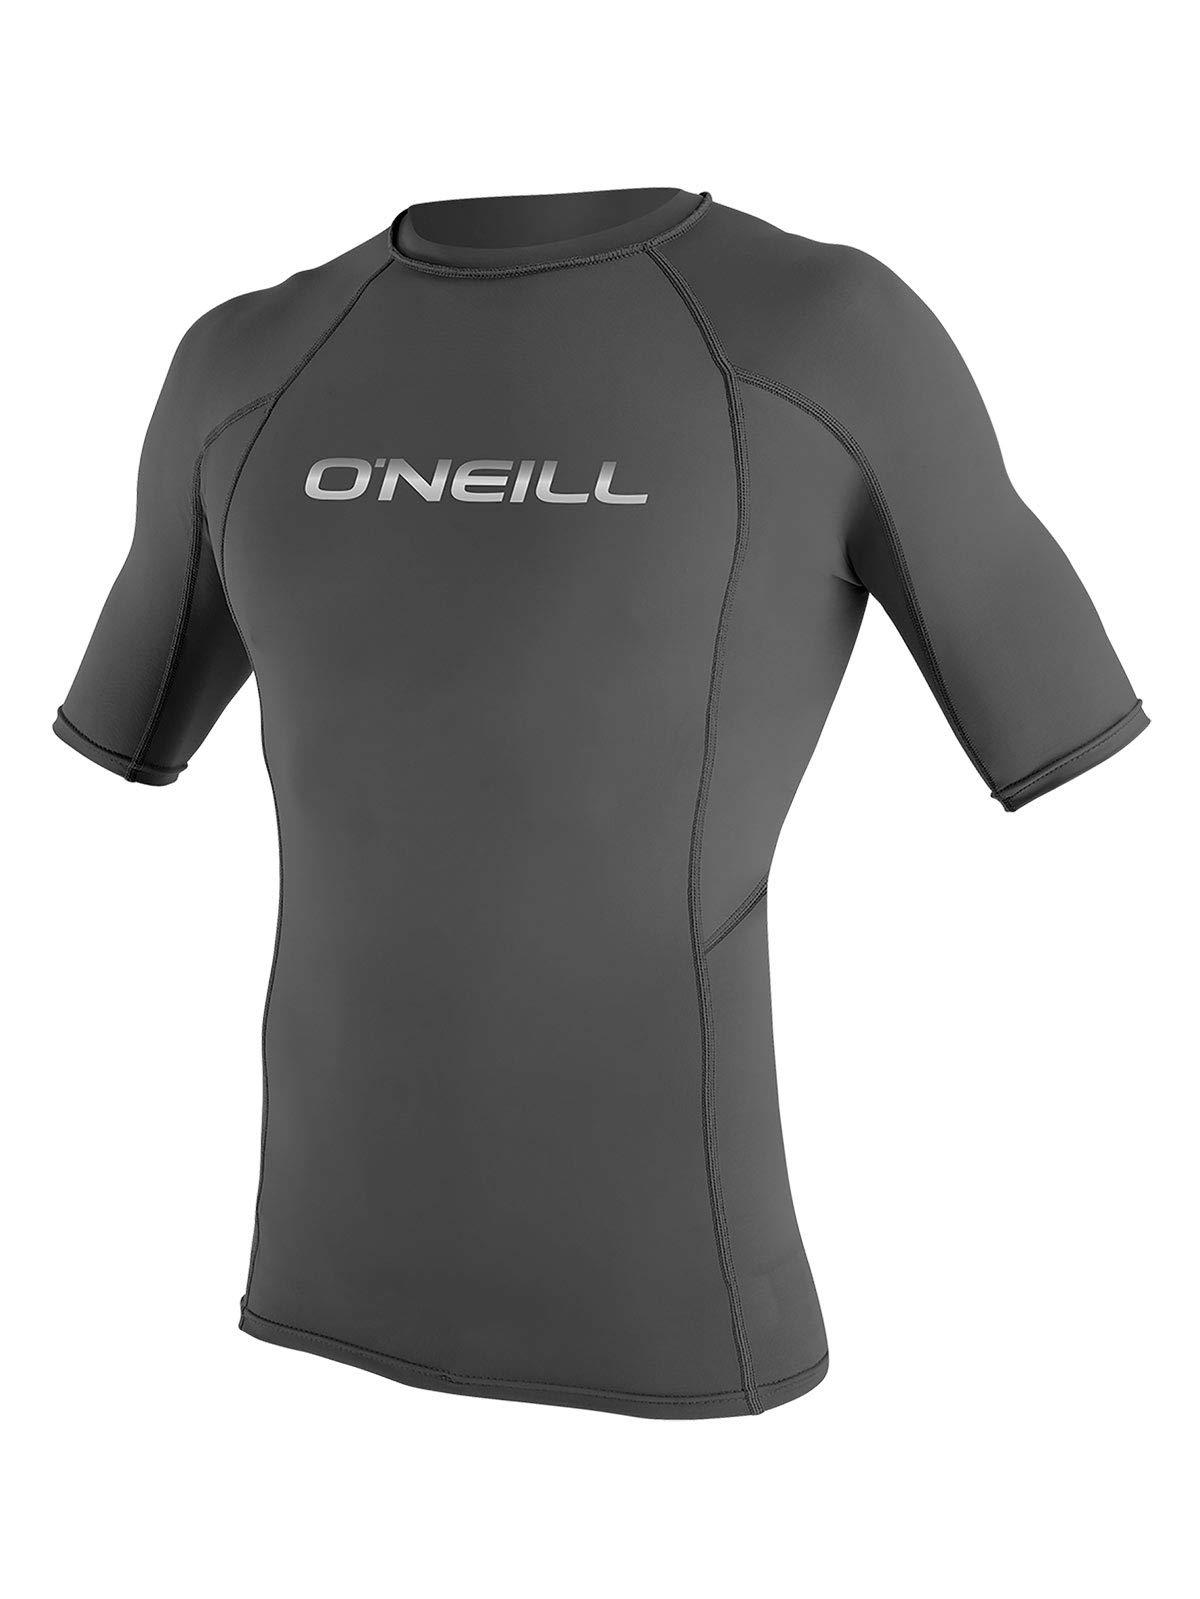 O'Neill Men's Basic Skins Short Sleeve Rashguard 4XL Graphite (3341IB)